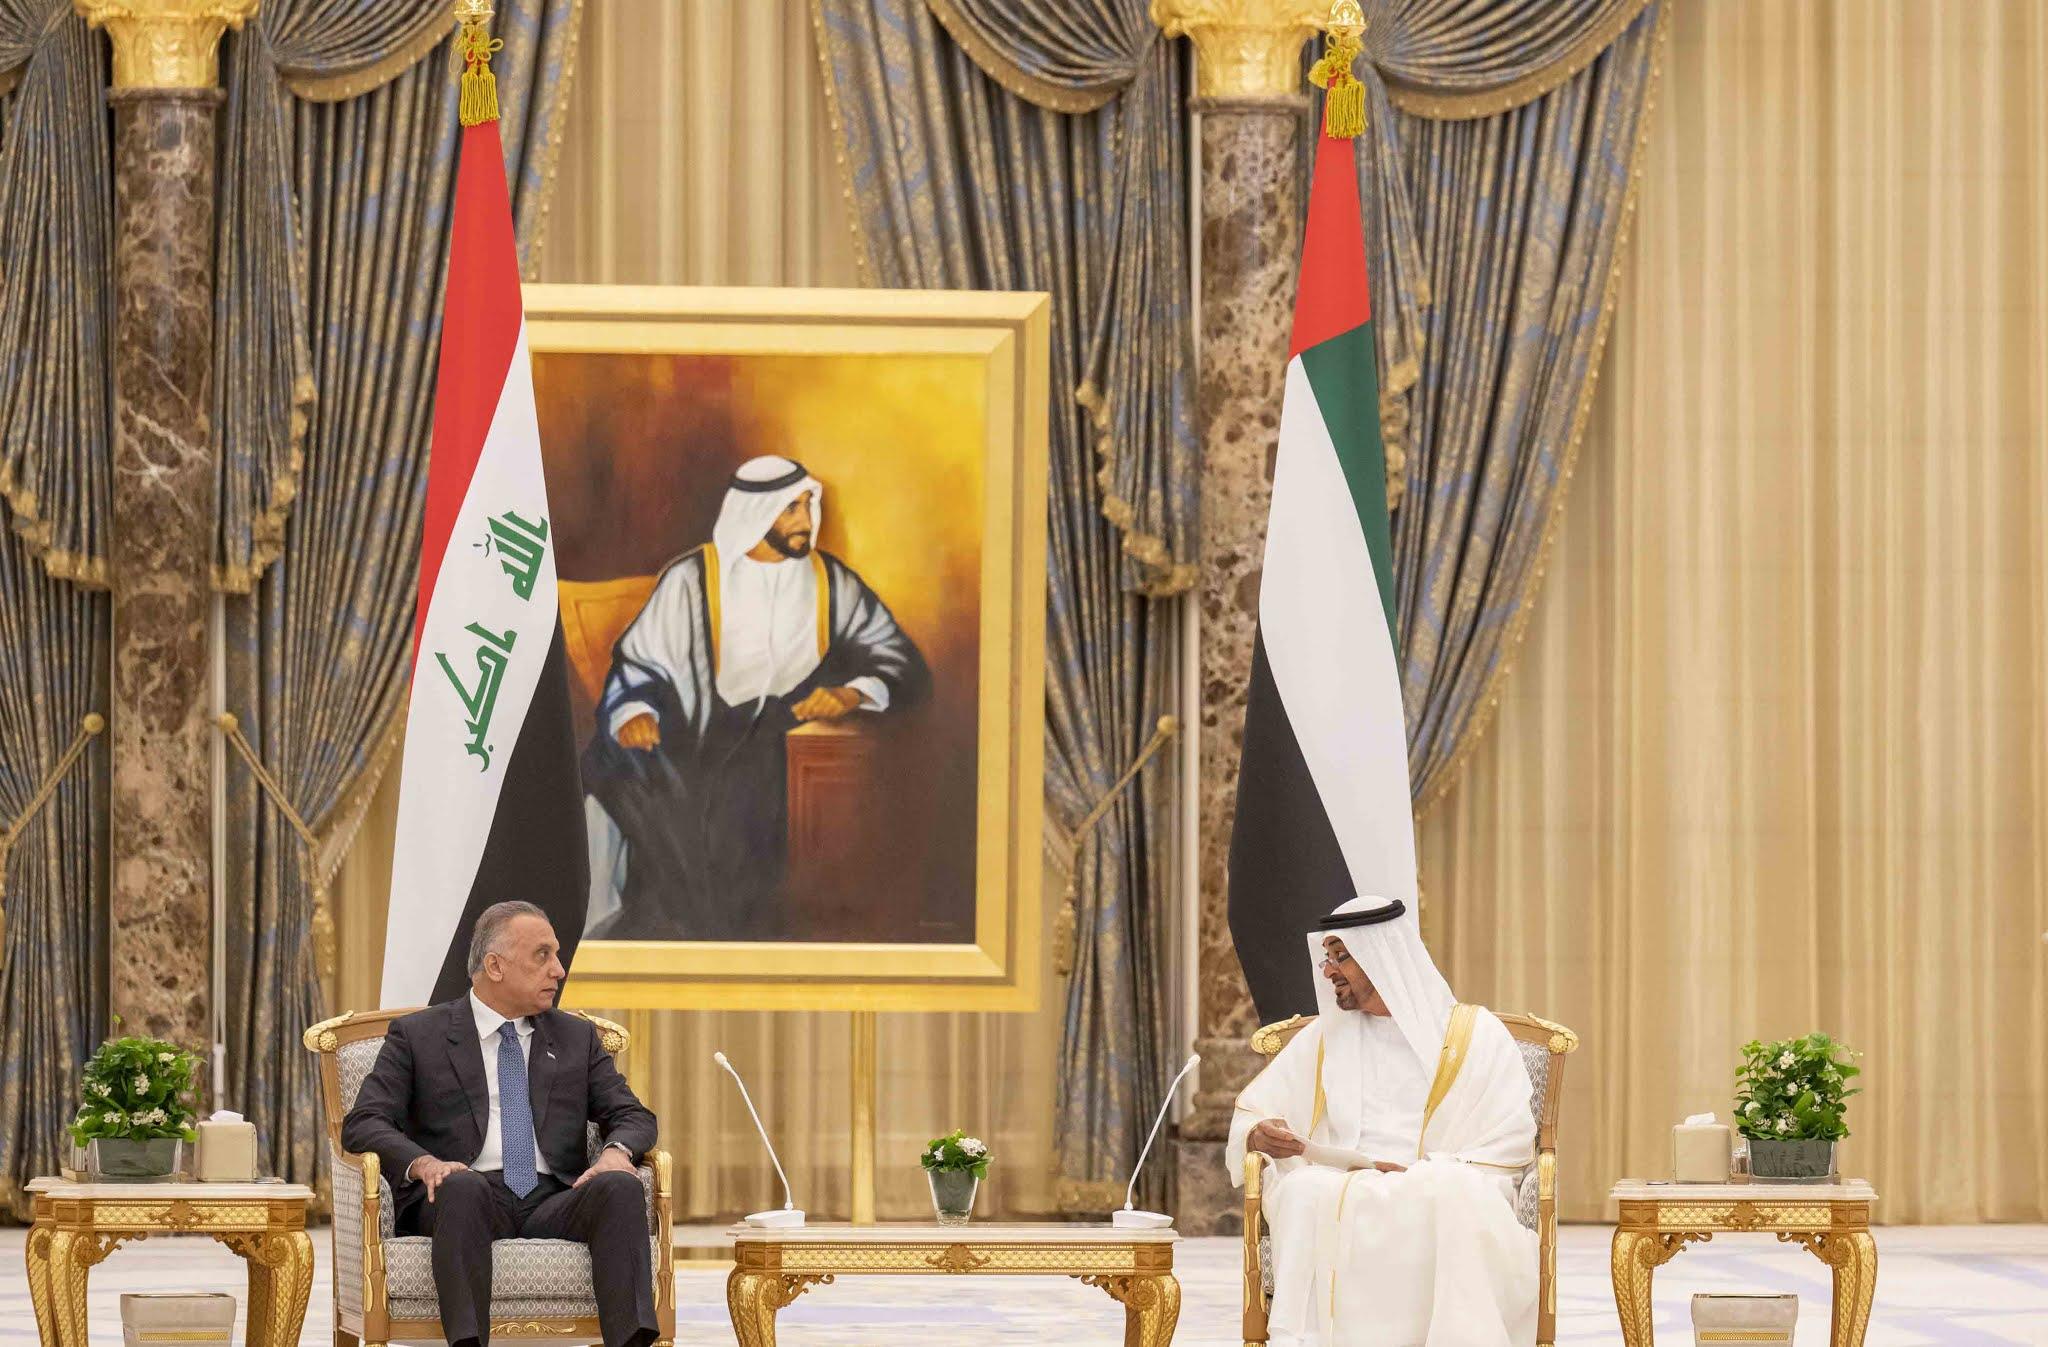 Iraq prime minister meets Sheikh Mohamed bin Zayed in Abu Dhabi